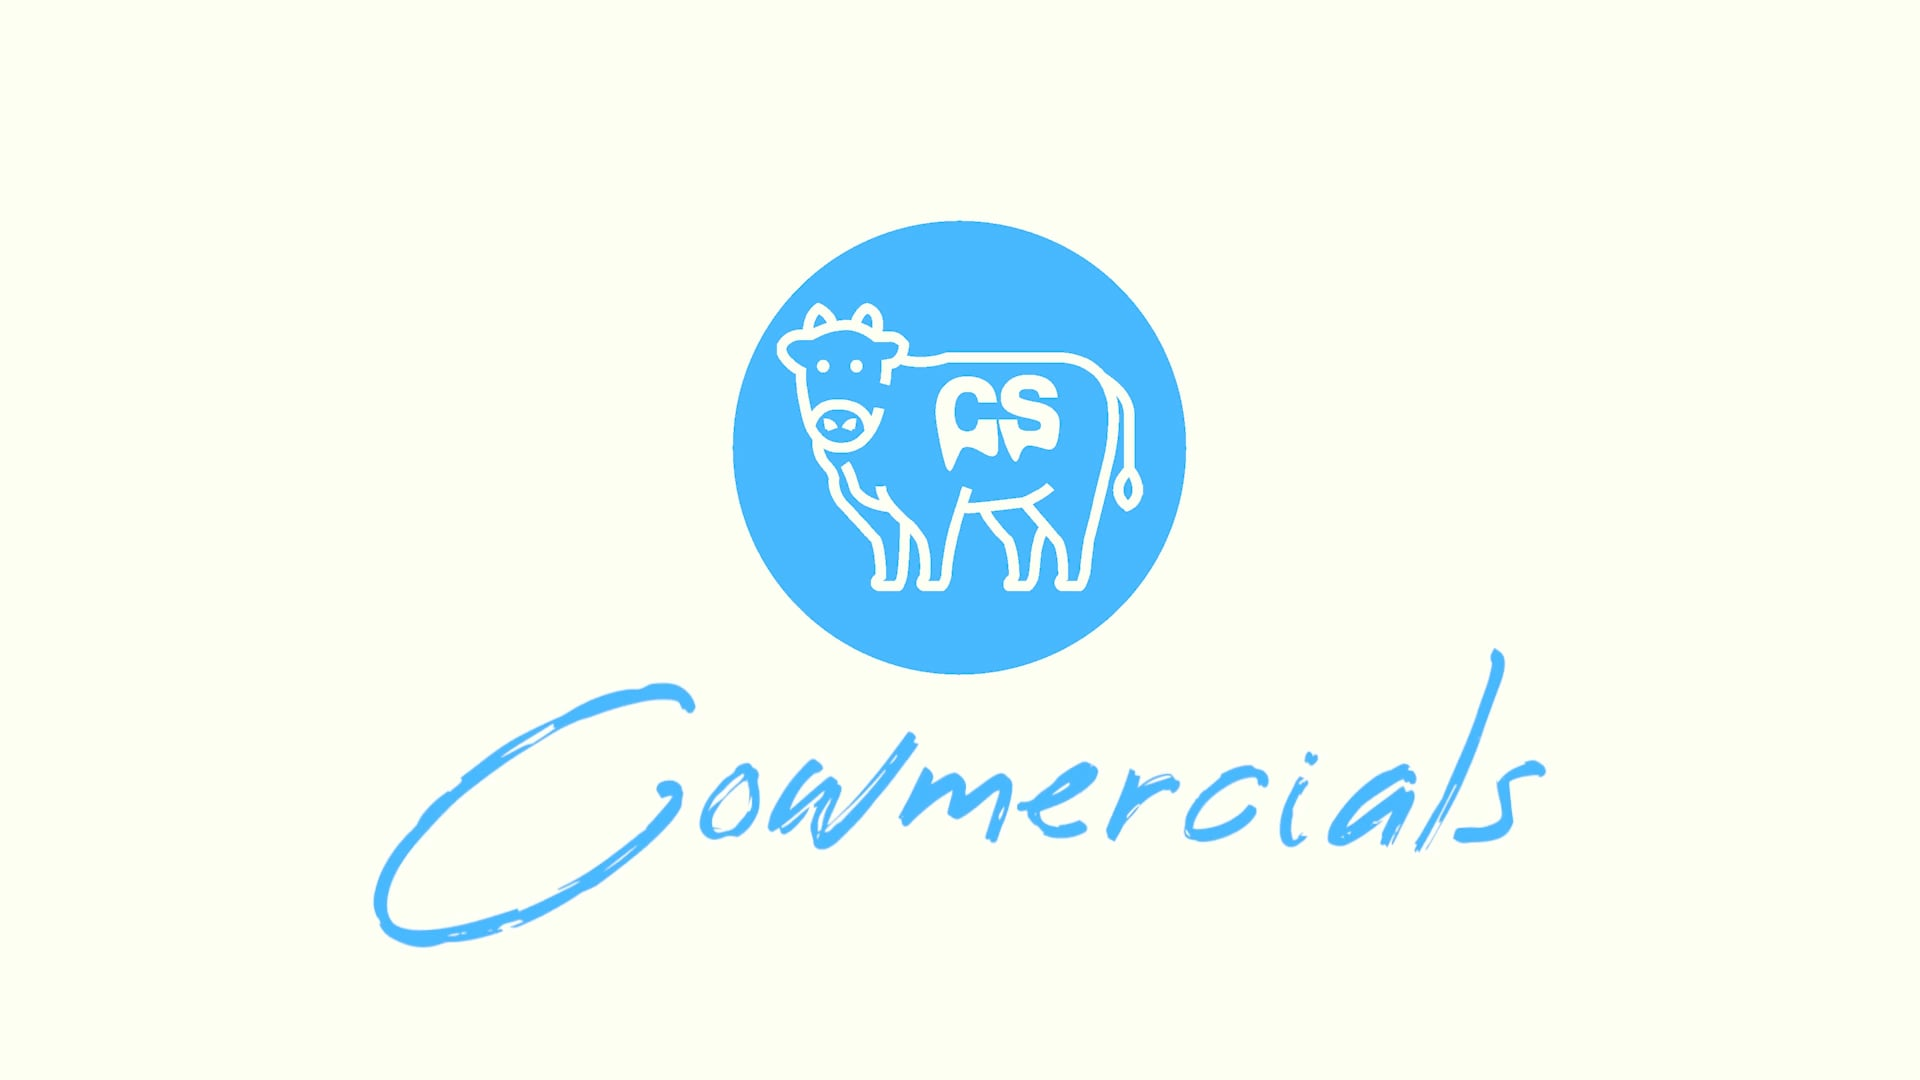 Cowsomething Commercial Showreel (Cowmercials)